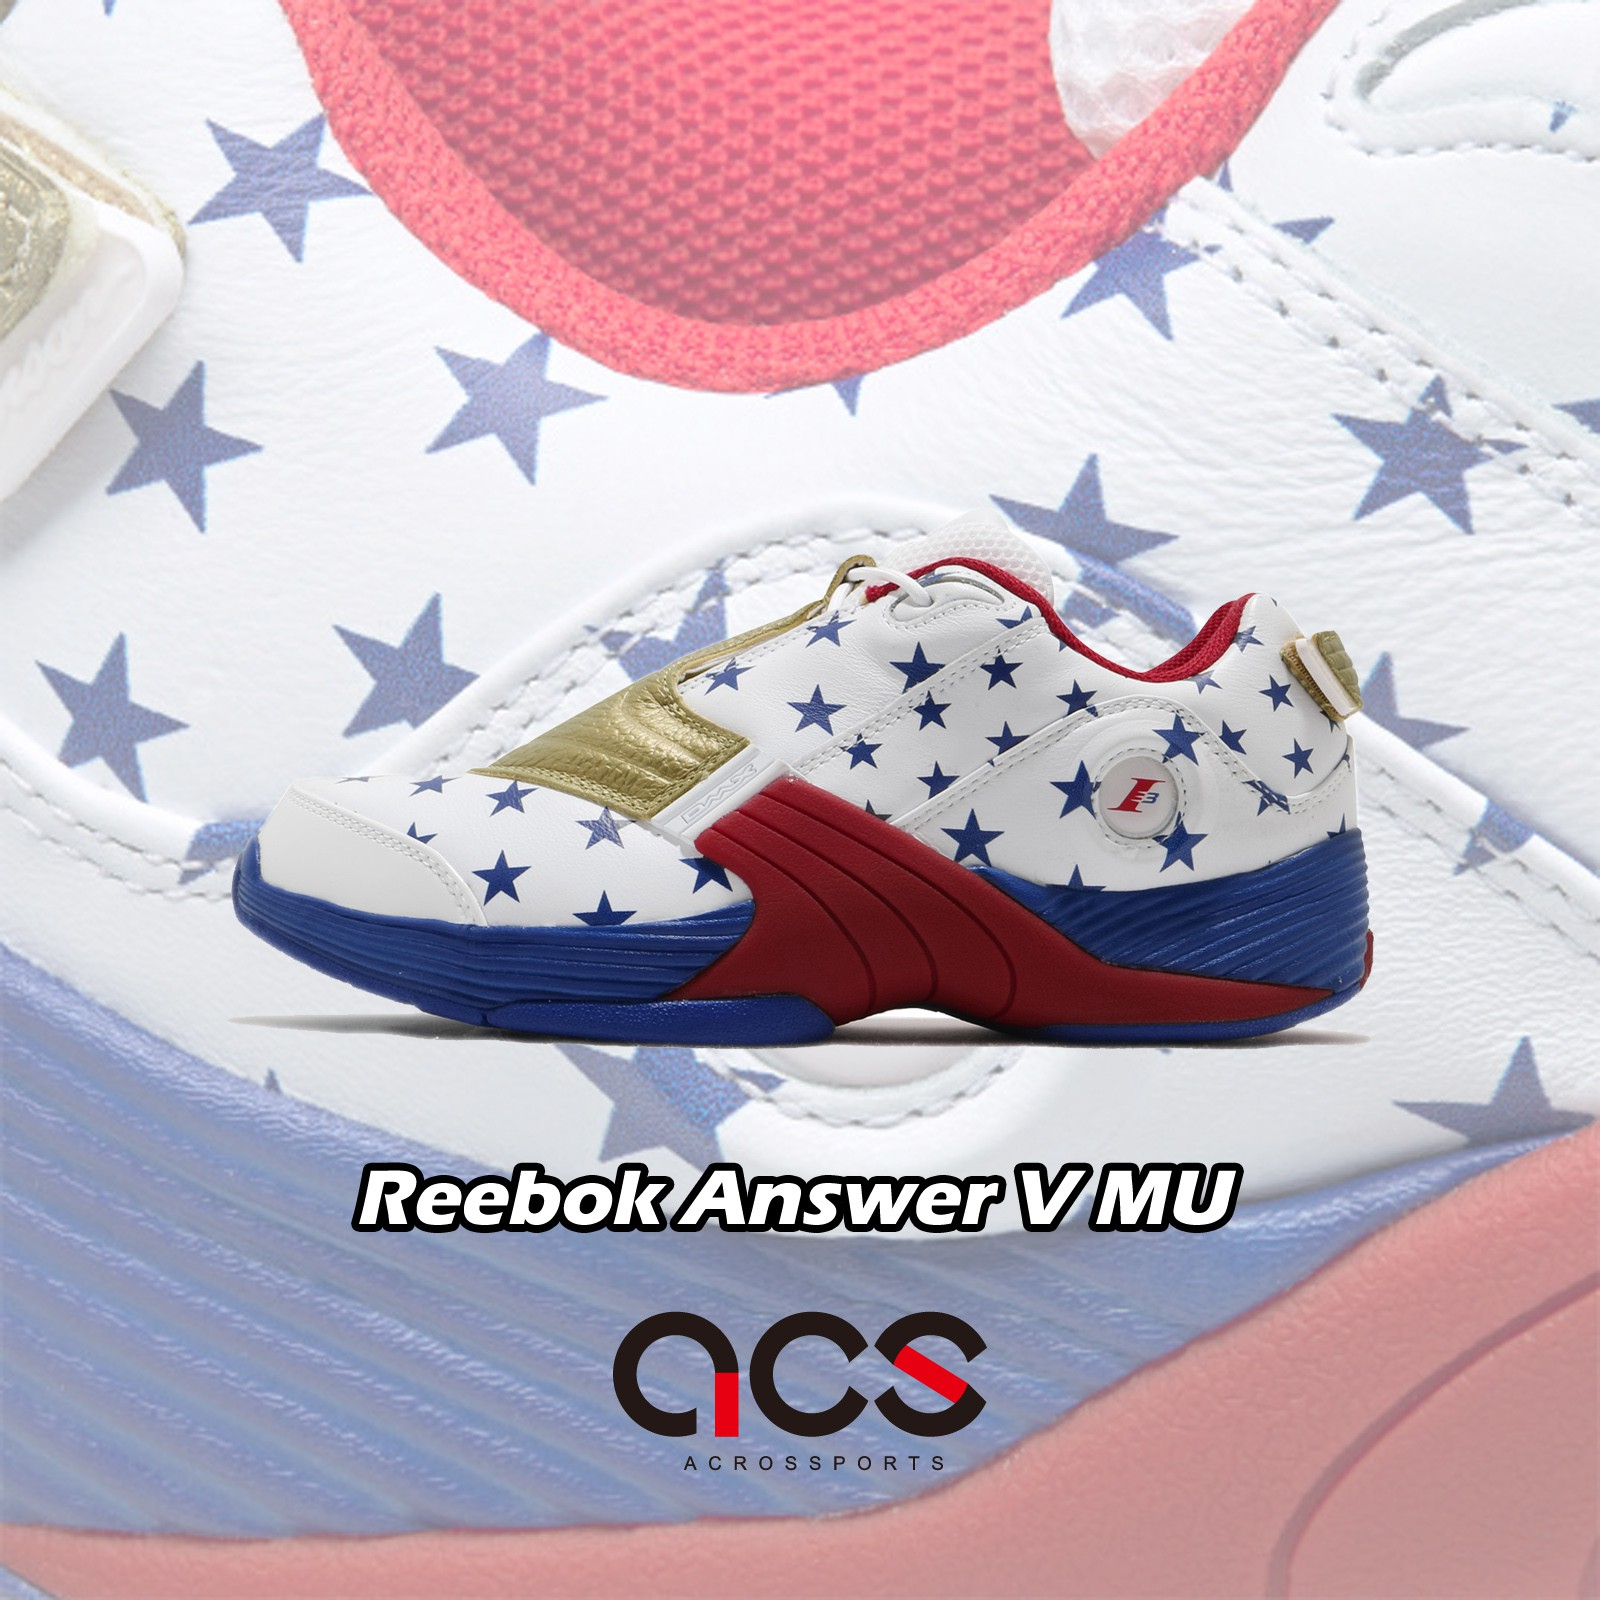 Reebok 籃球鞋 Answer V MU 白 藍 男鞋 美國旗星星 皮革 運動鞋 【ACS】 FW7486